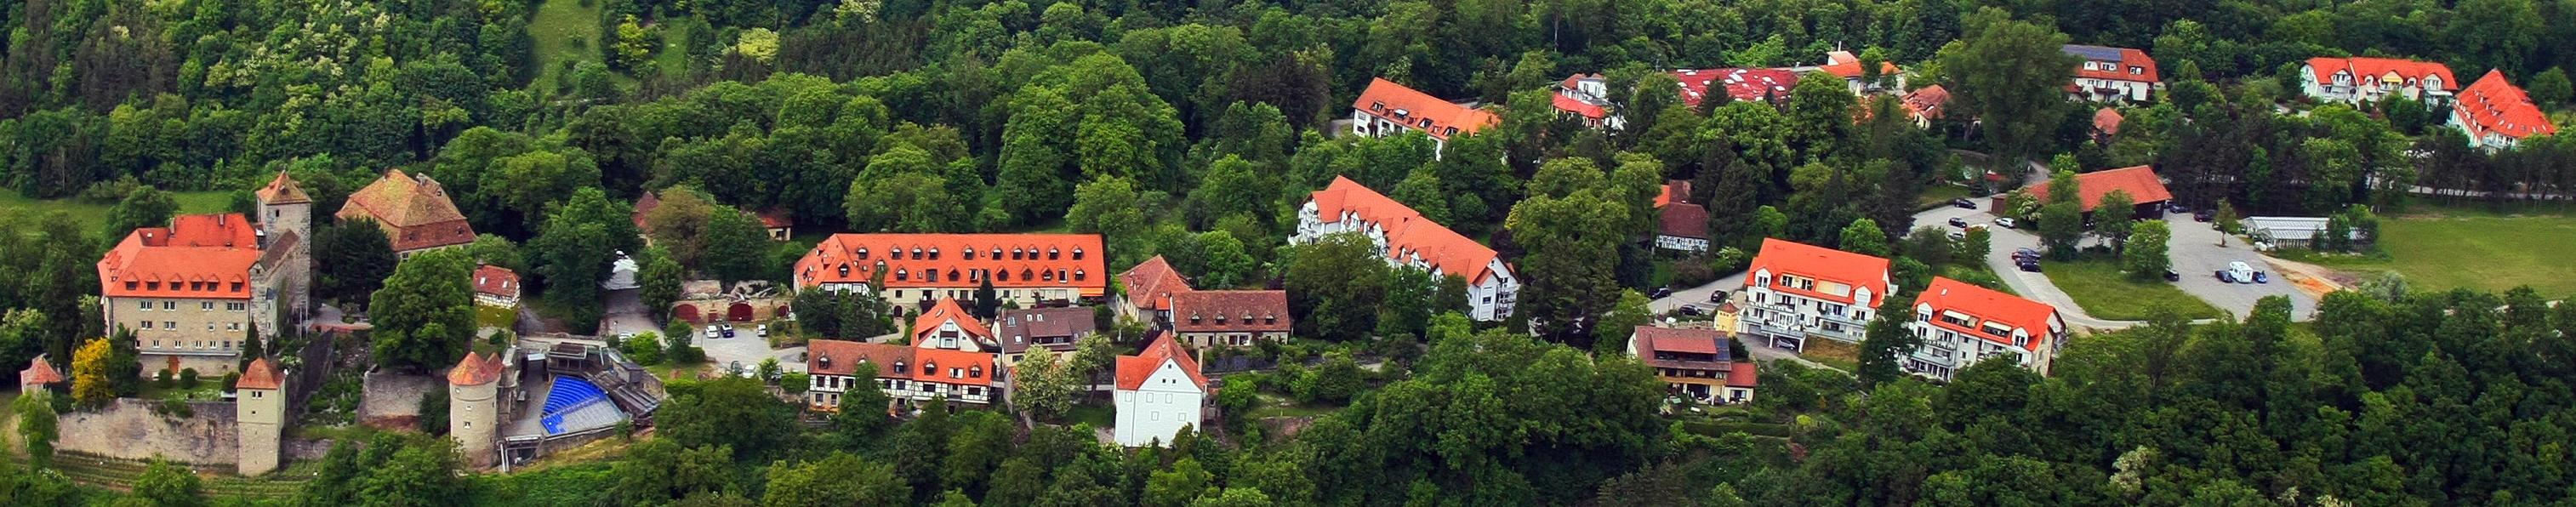 Residenzen Schloß Stetten